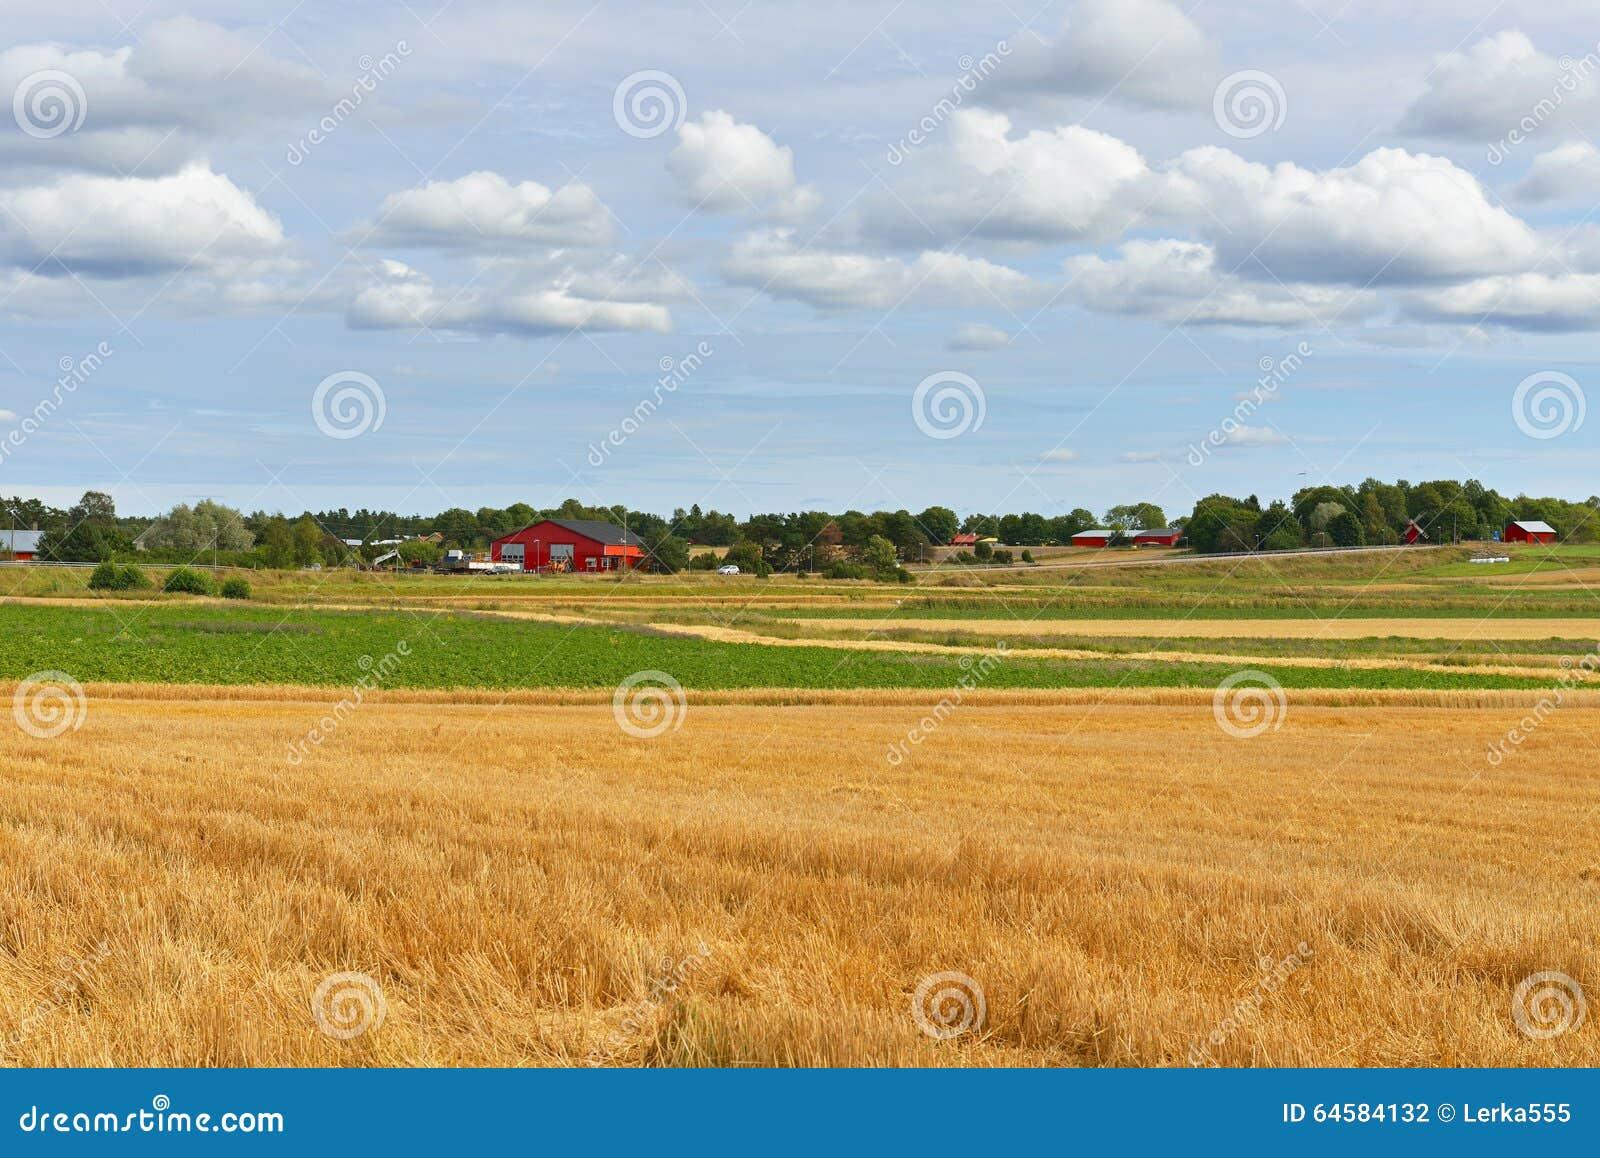 Ryefinland